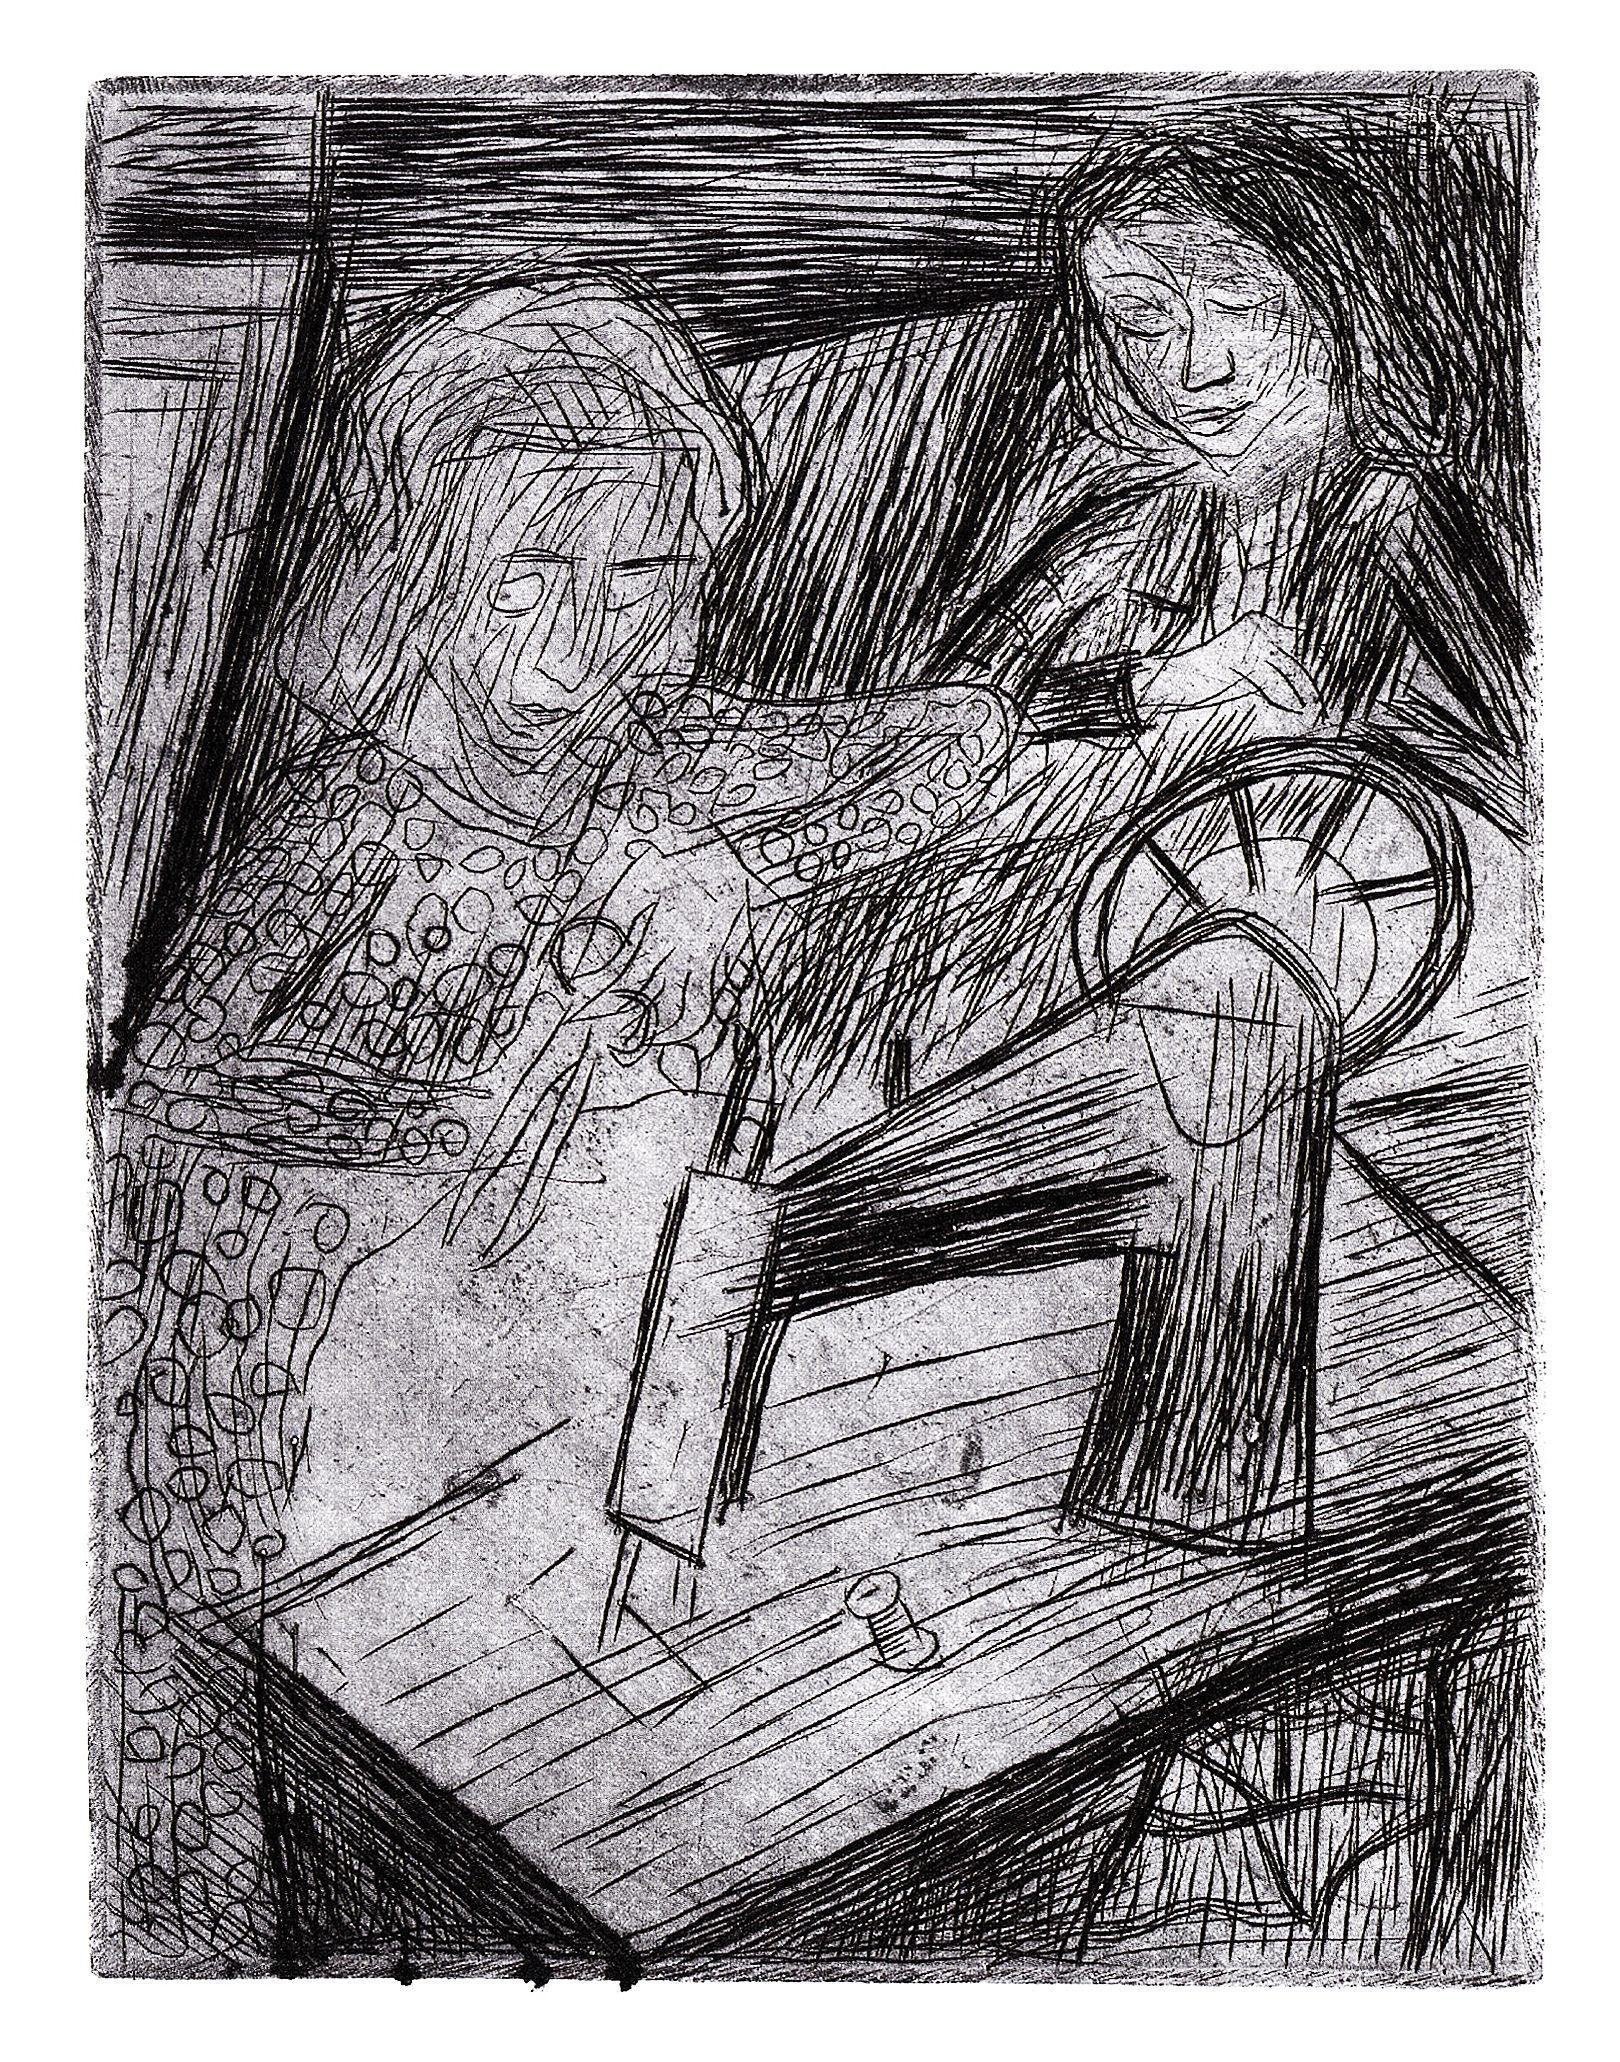 Леопольд Левицький. Швачки, 1932; офорт